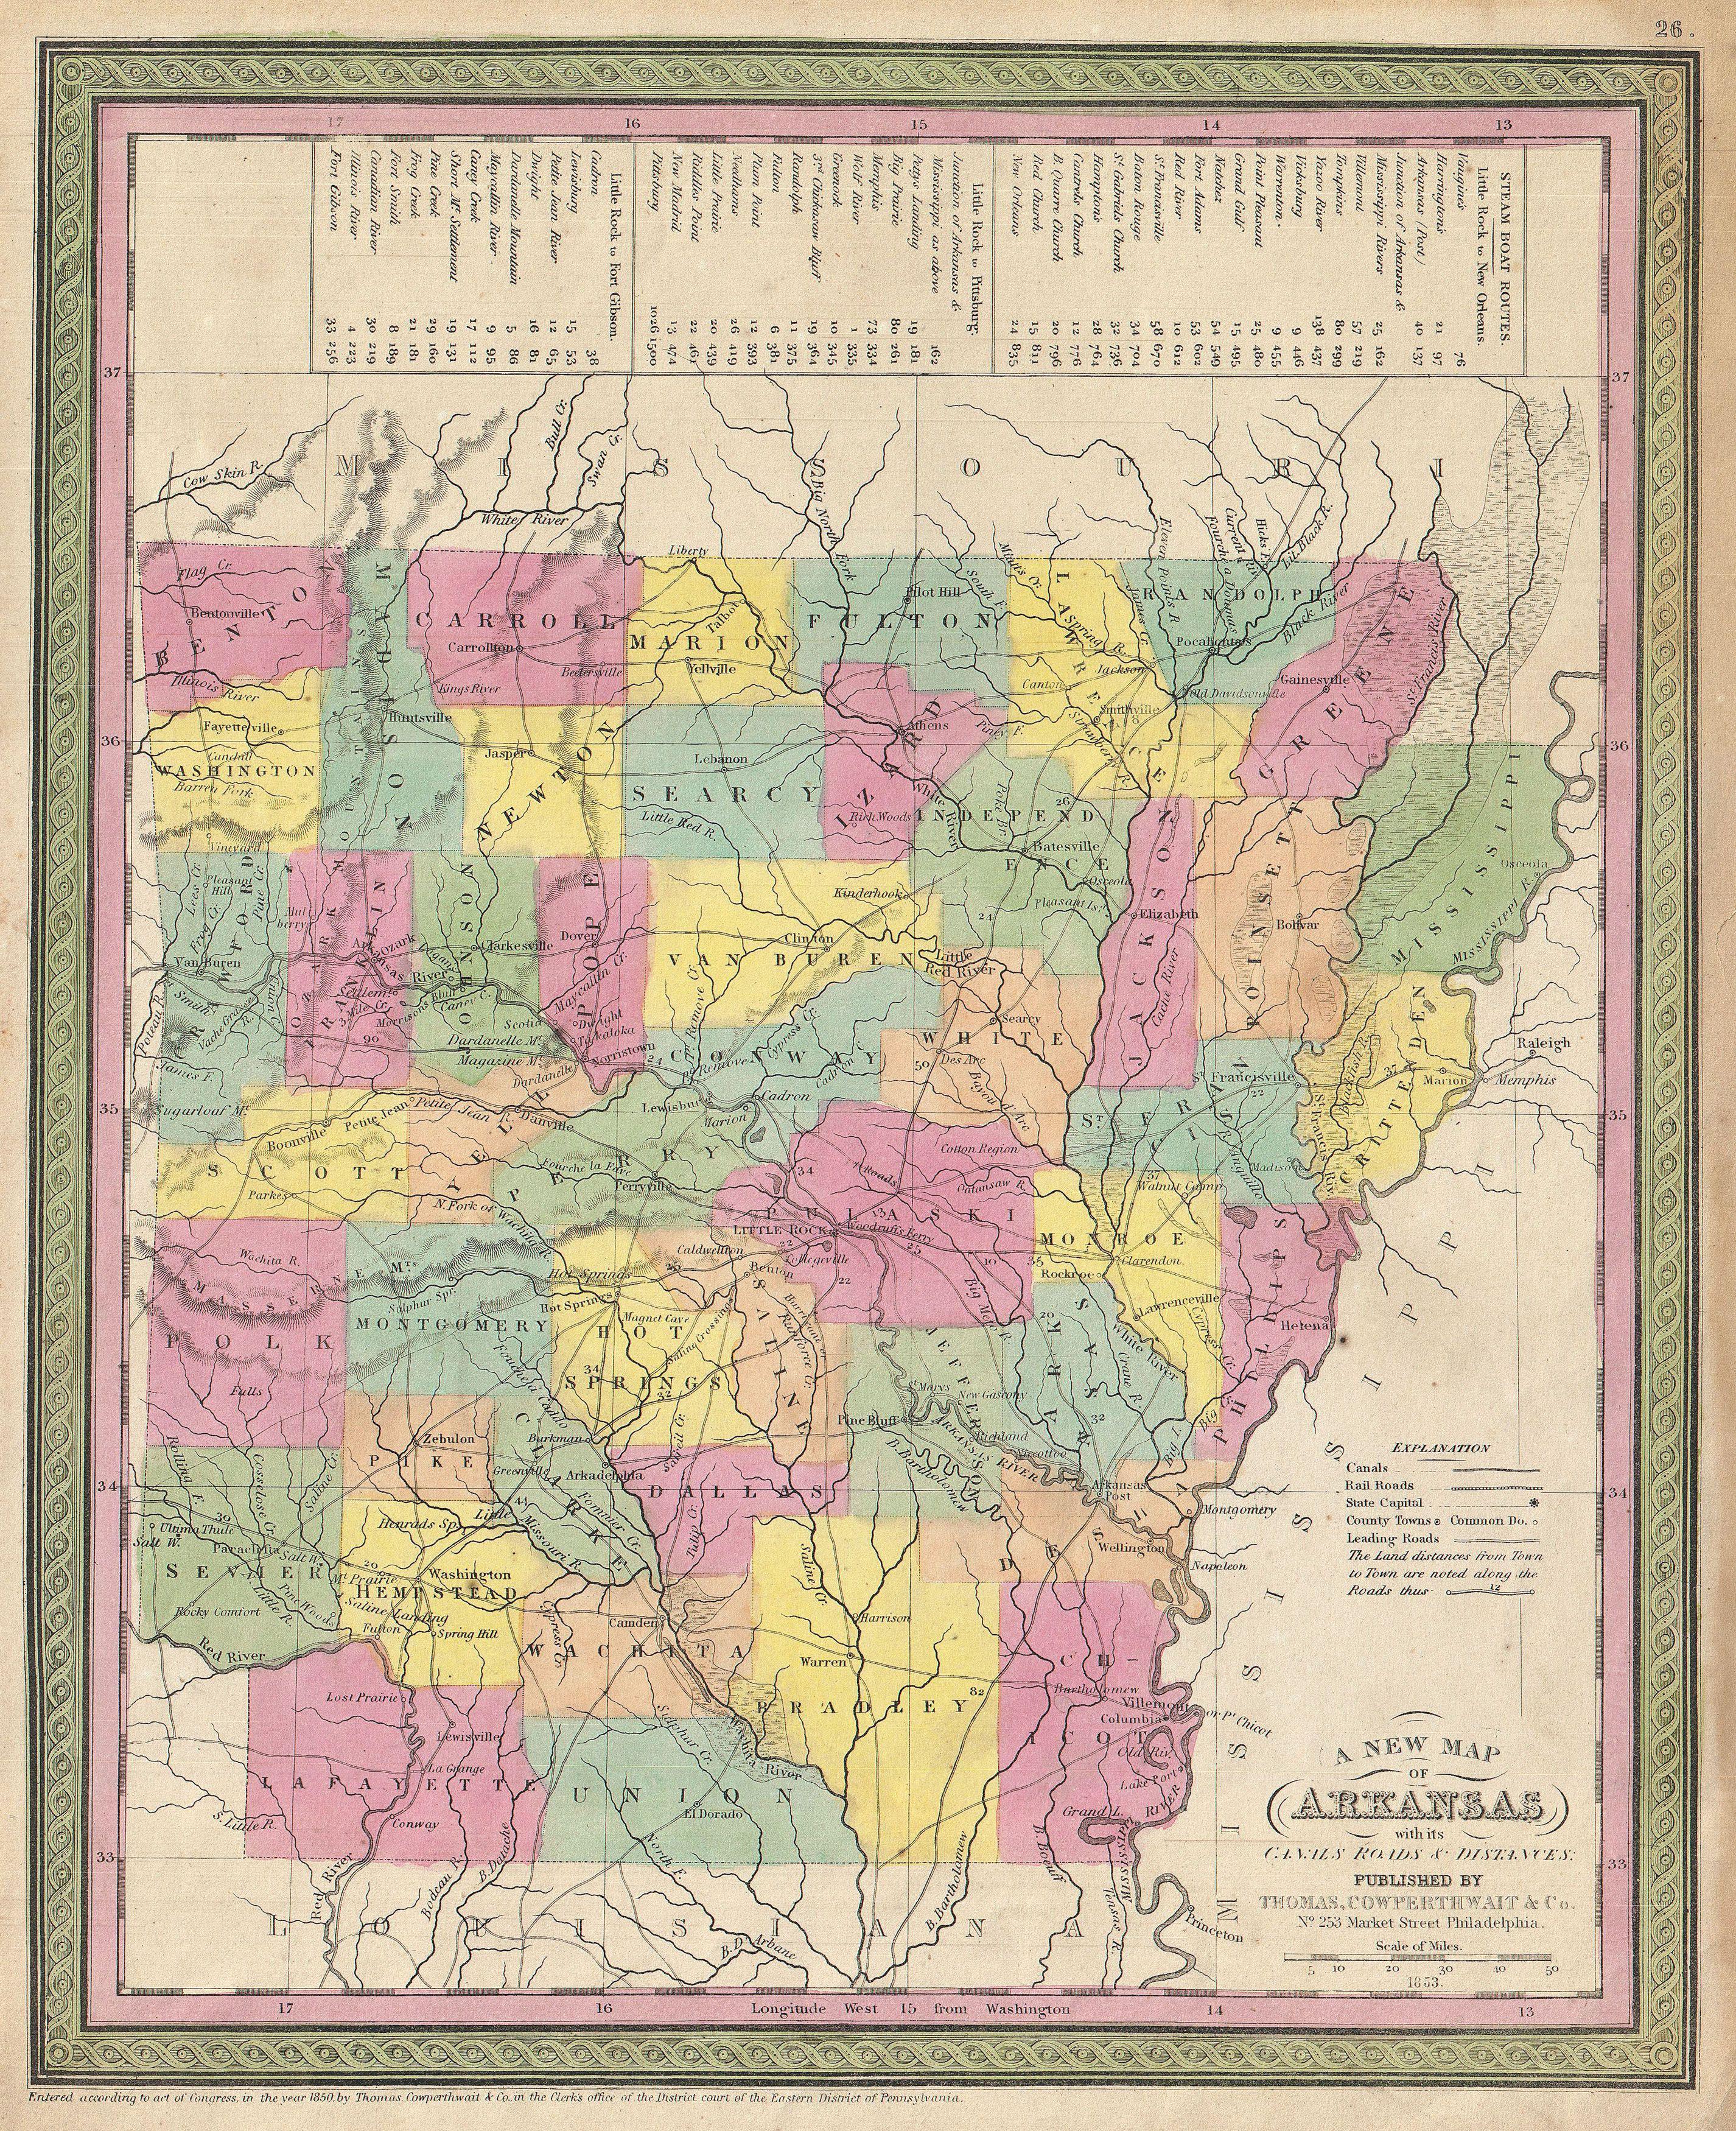 map of arizona, map of mo, map of arga, map of arkansas, map of ca, map of ok, map of gh, map of vb, map of il, map of la, map of gl, map of re, map of va, map of le, map of lp, map of ic, map of ms, map of tx, map of usa, map of ak, on map of ar